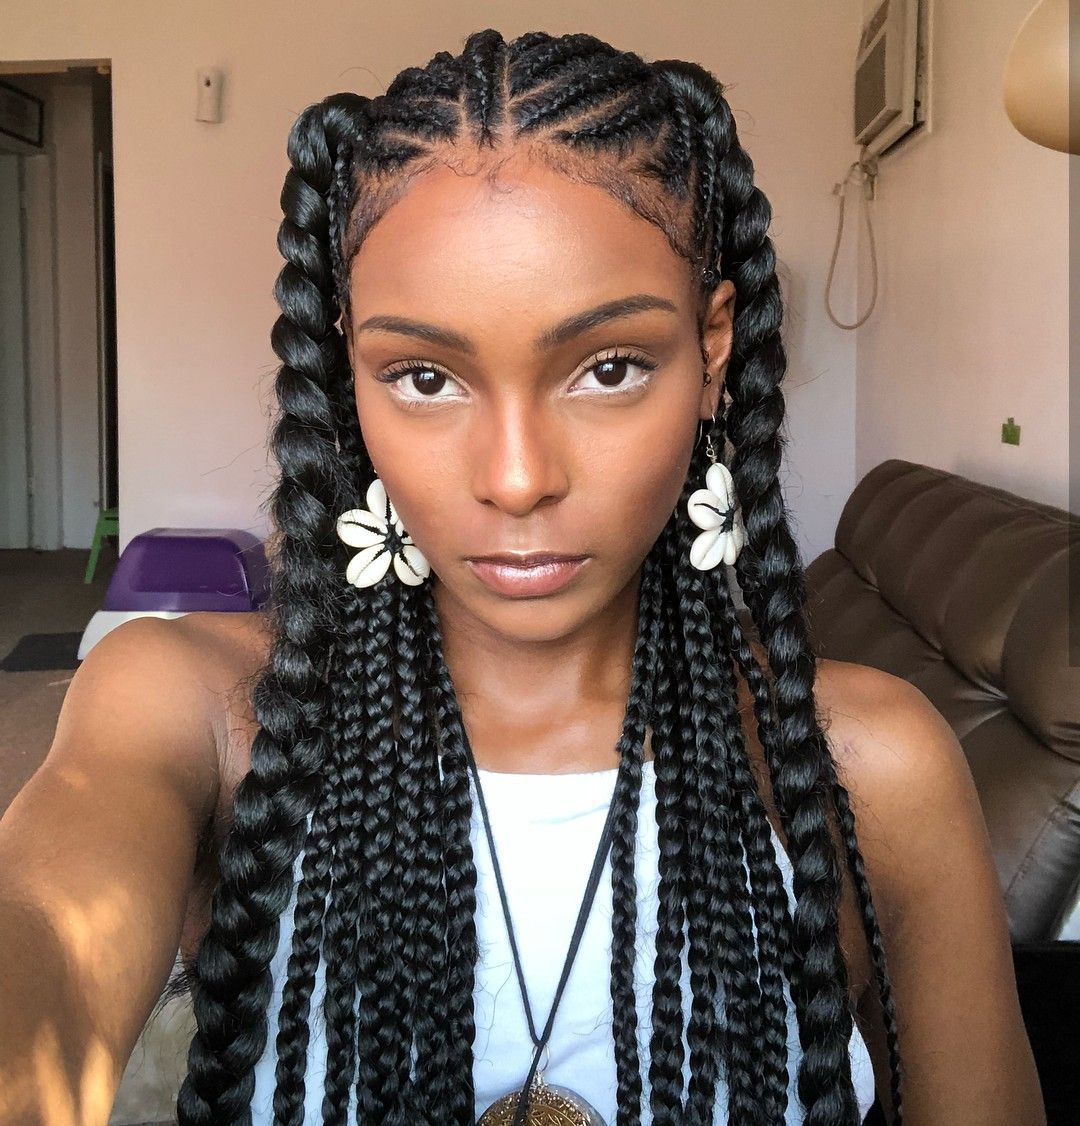 50 African Hair Braiding Styles Ideas For Extra Inspiration Thrivenaija In 2020 African Braids Hairstyles Natural Hair Styles Hair Styles